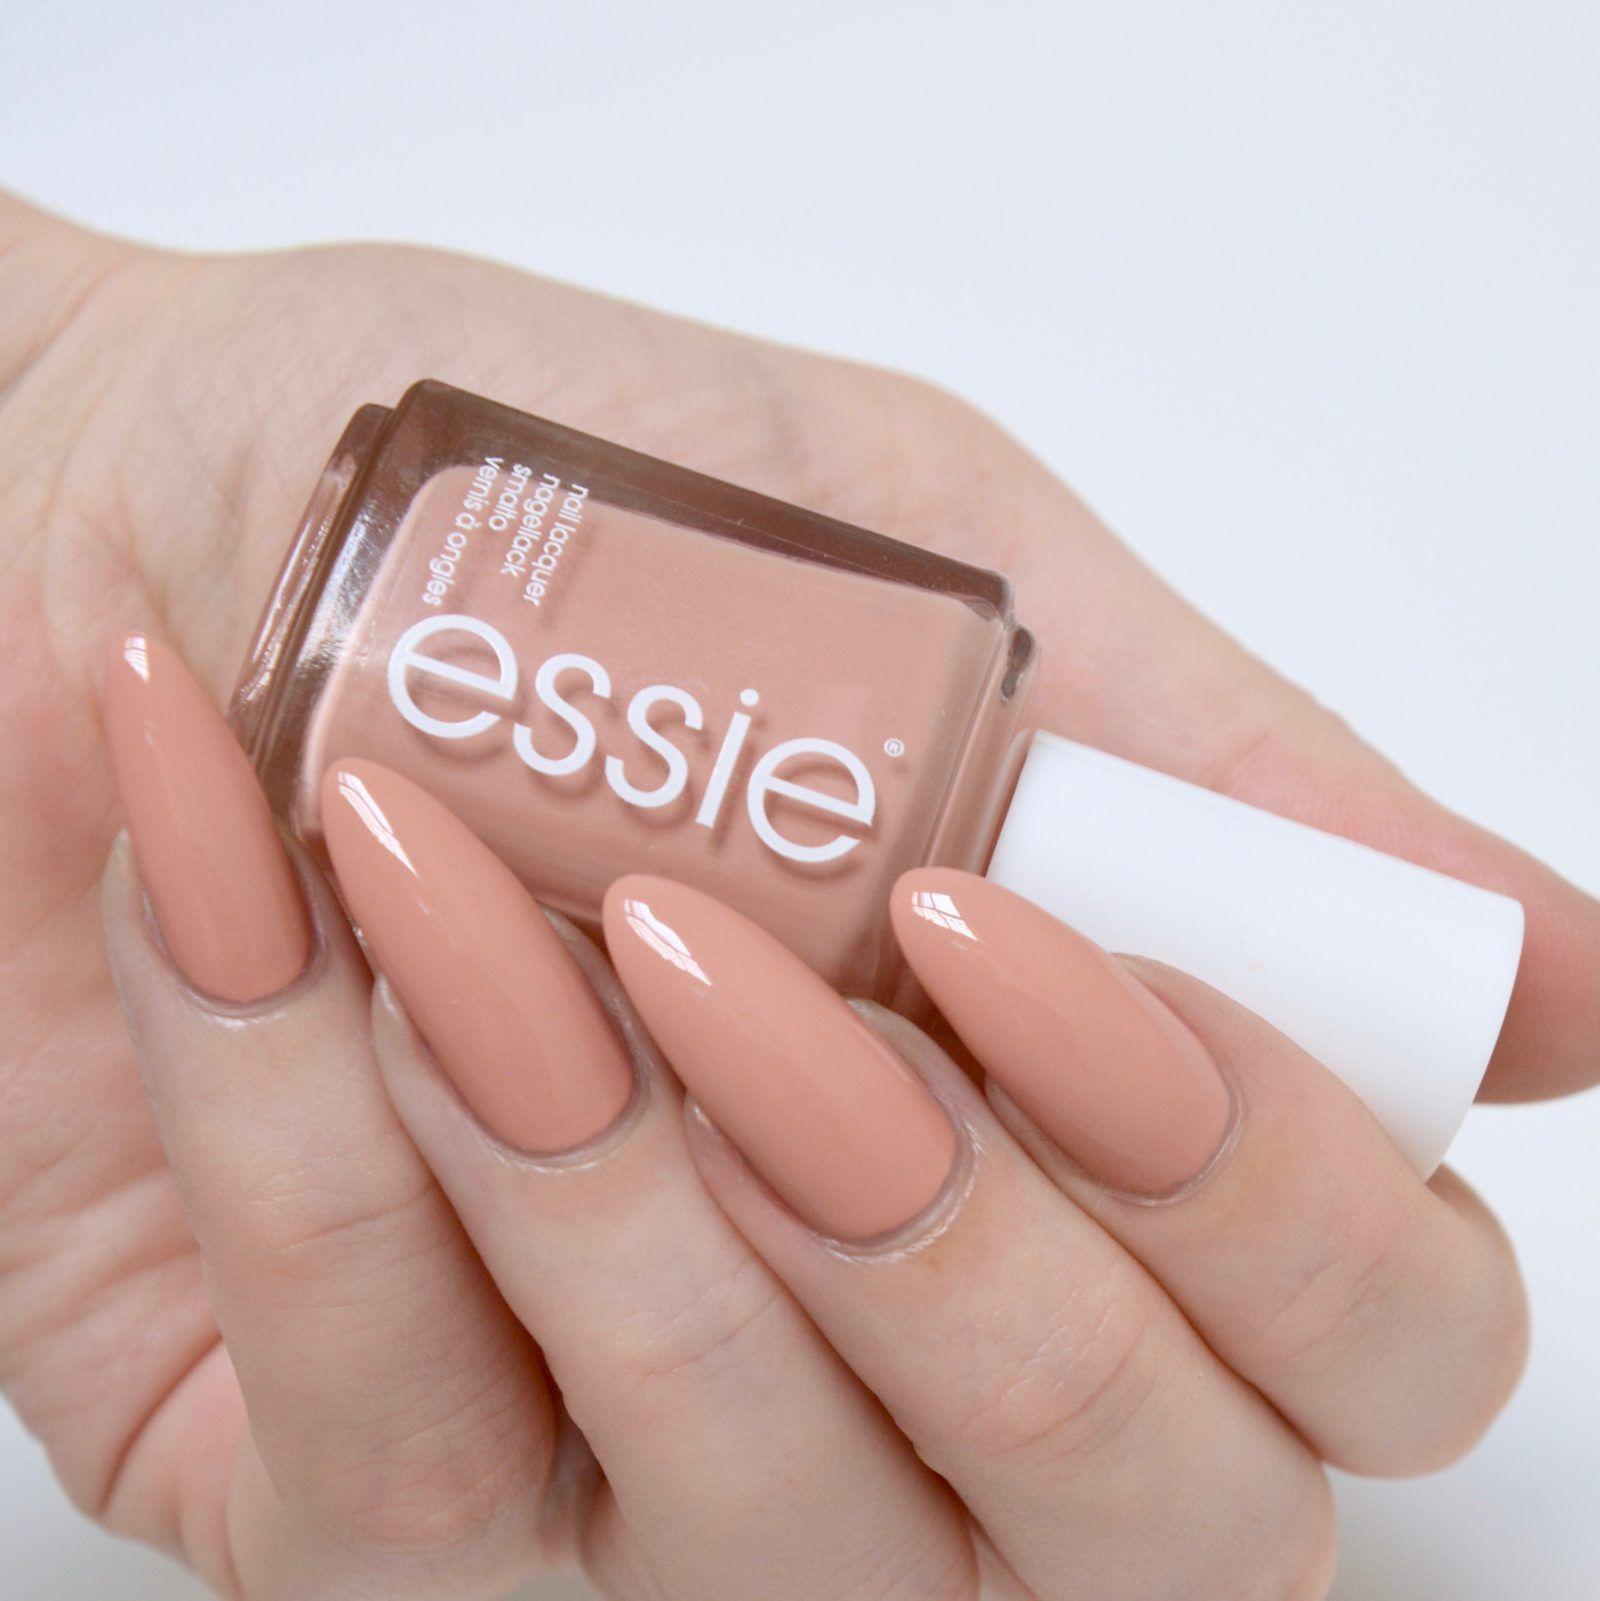 Essie Wild Nudes Collection Review | Esmalte